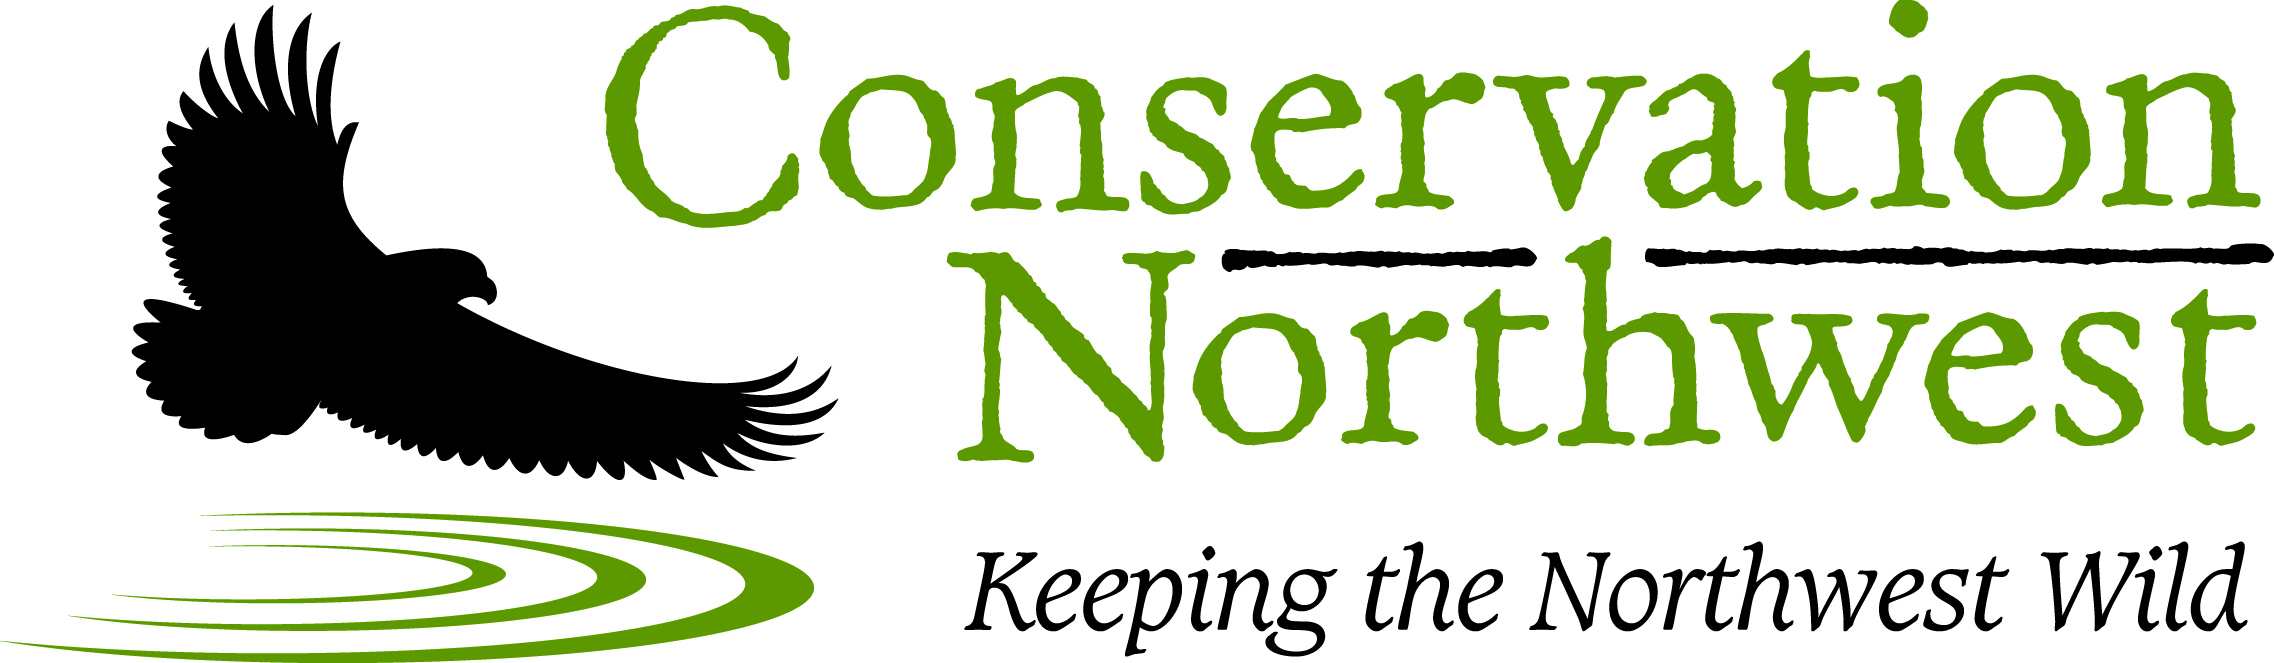 CNW_Logo_standard_high-res.jpg